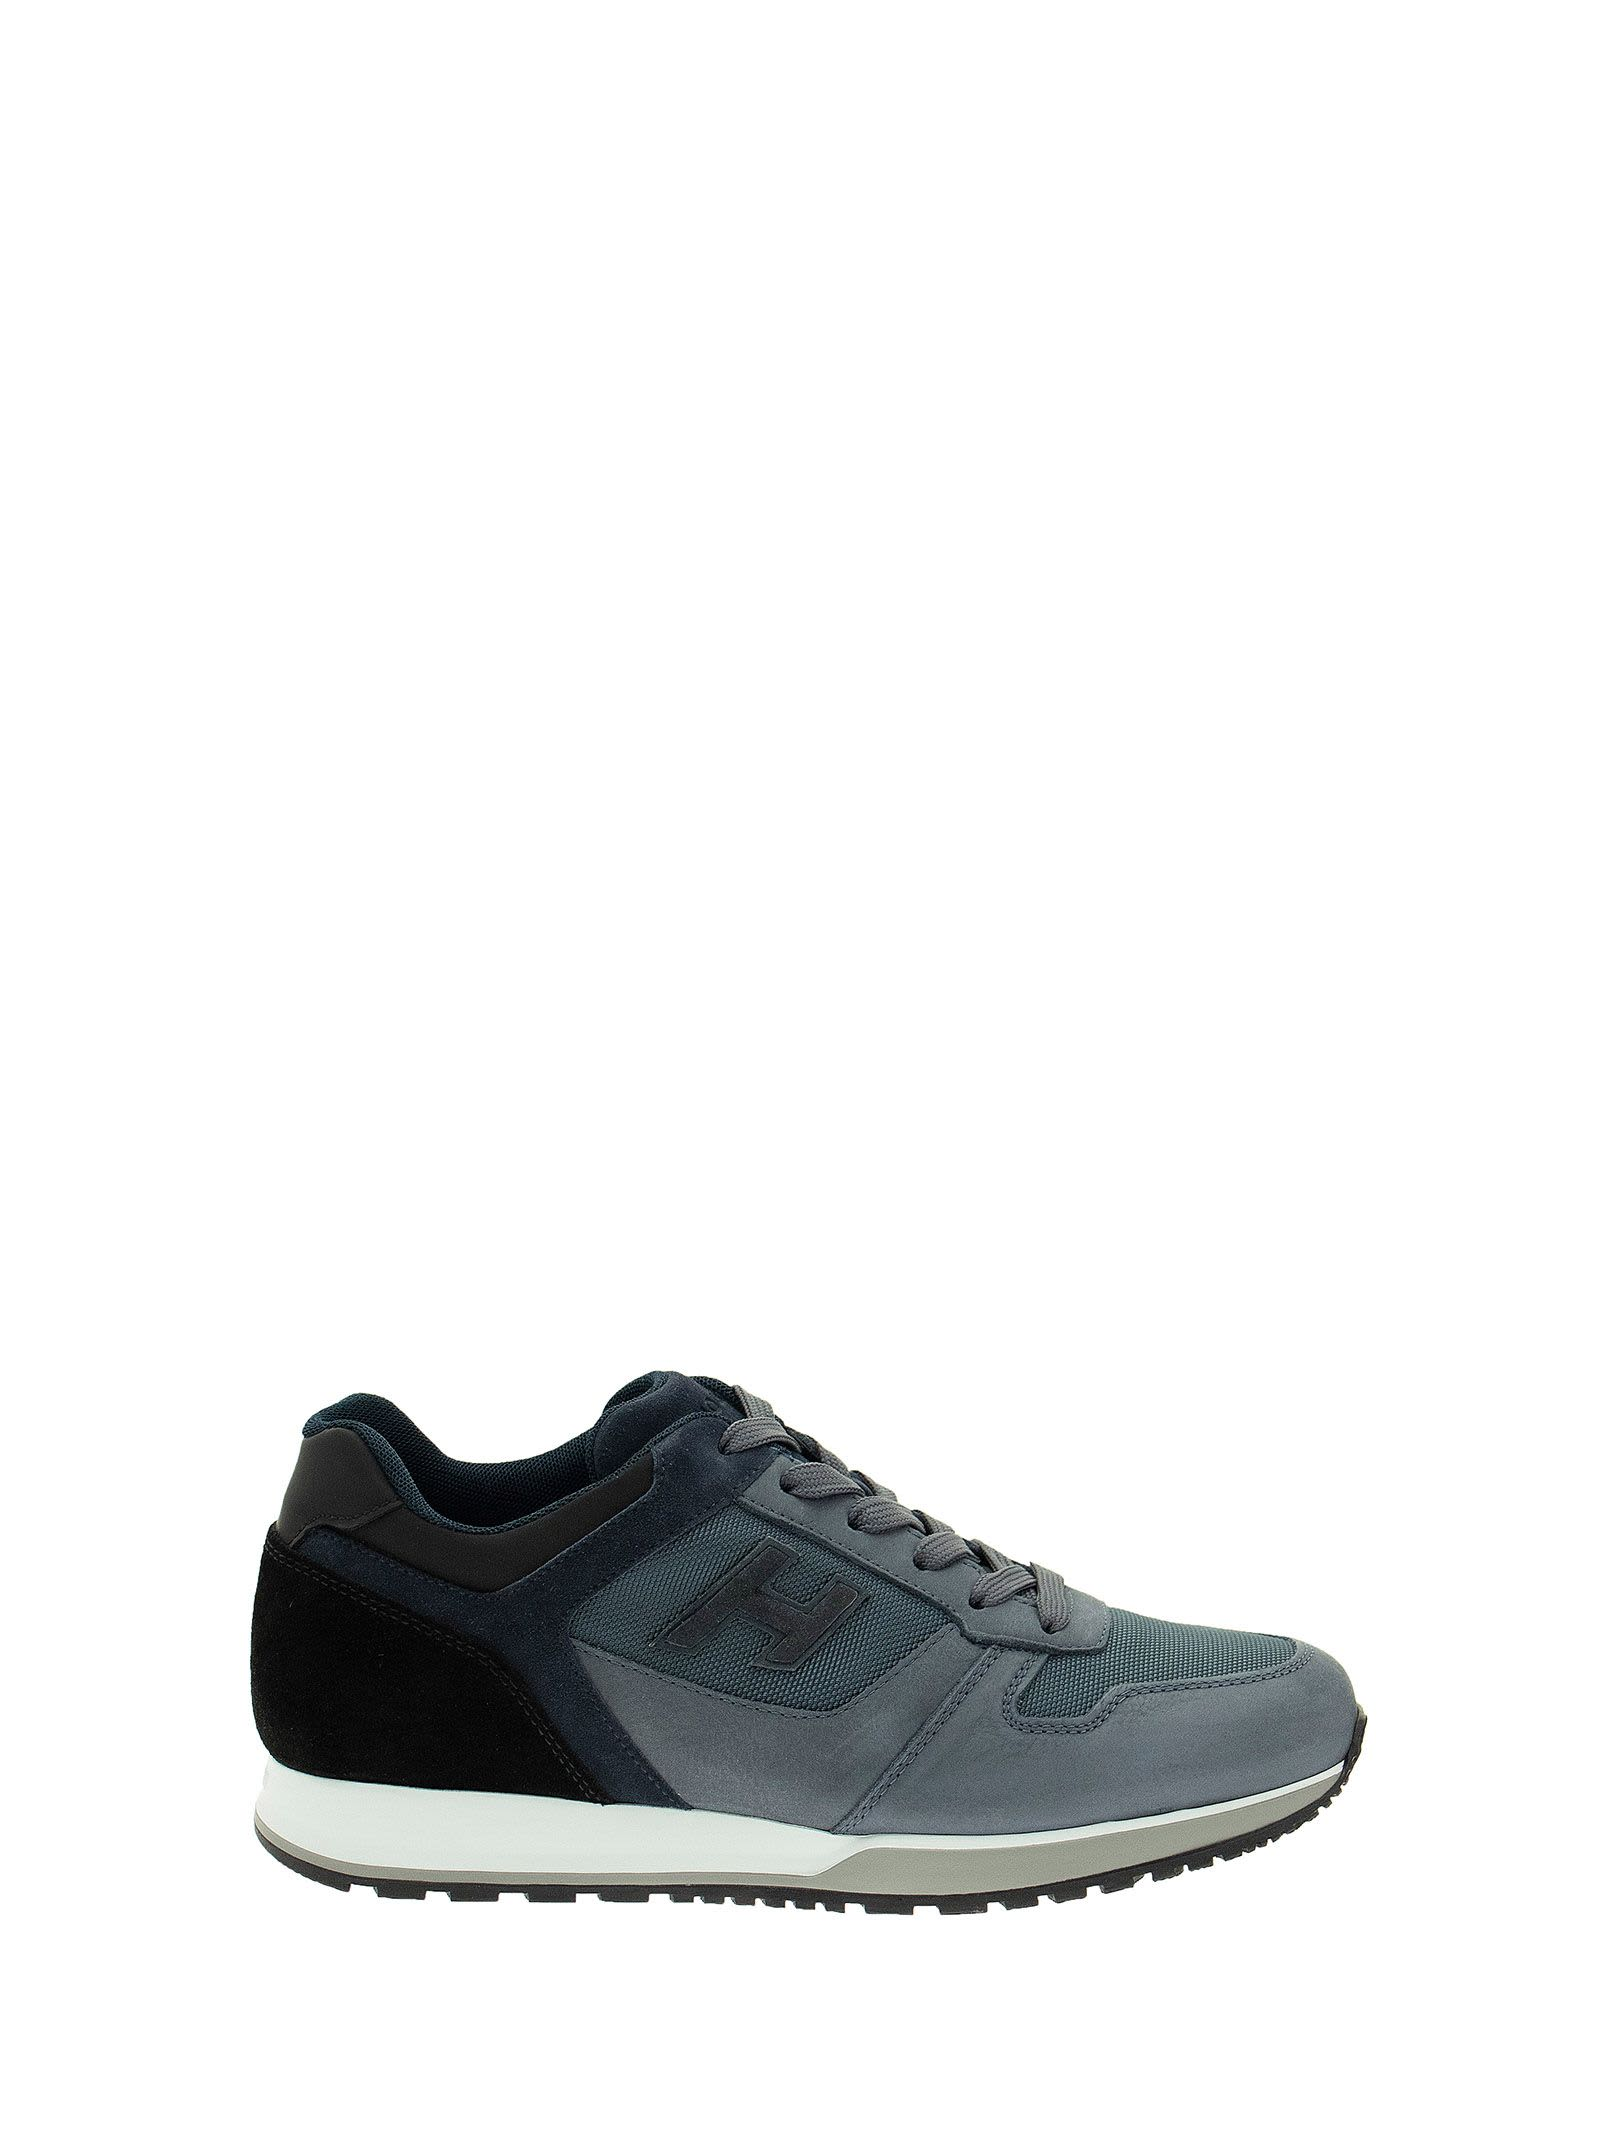 Hogan Sneakers H321 Blue/grey